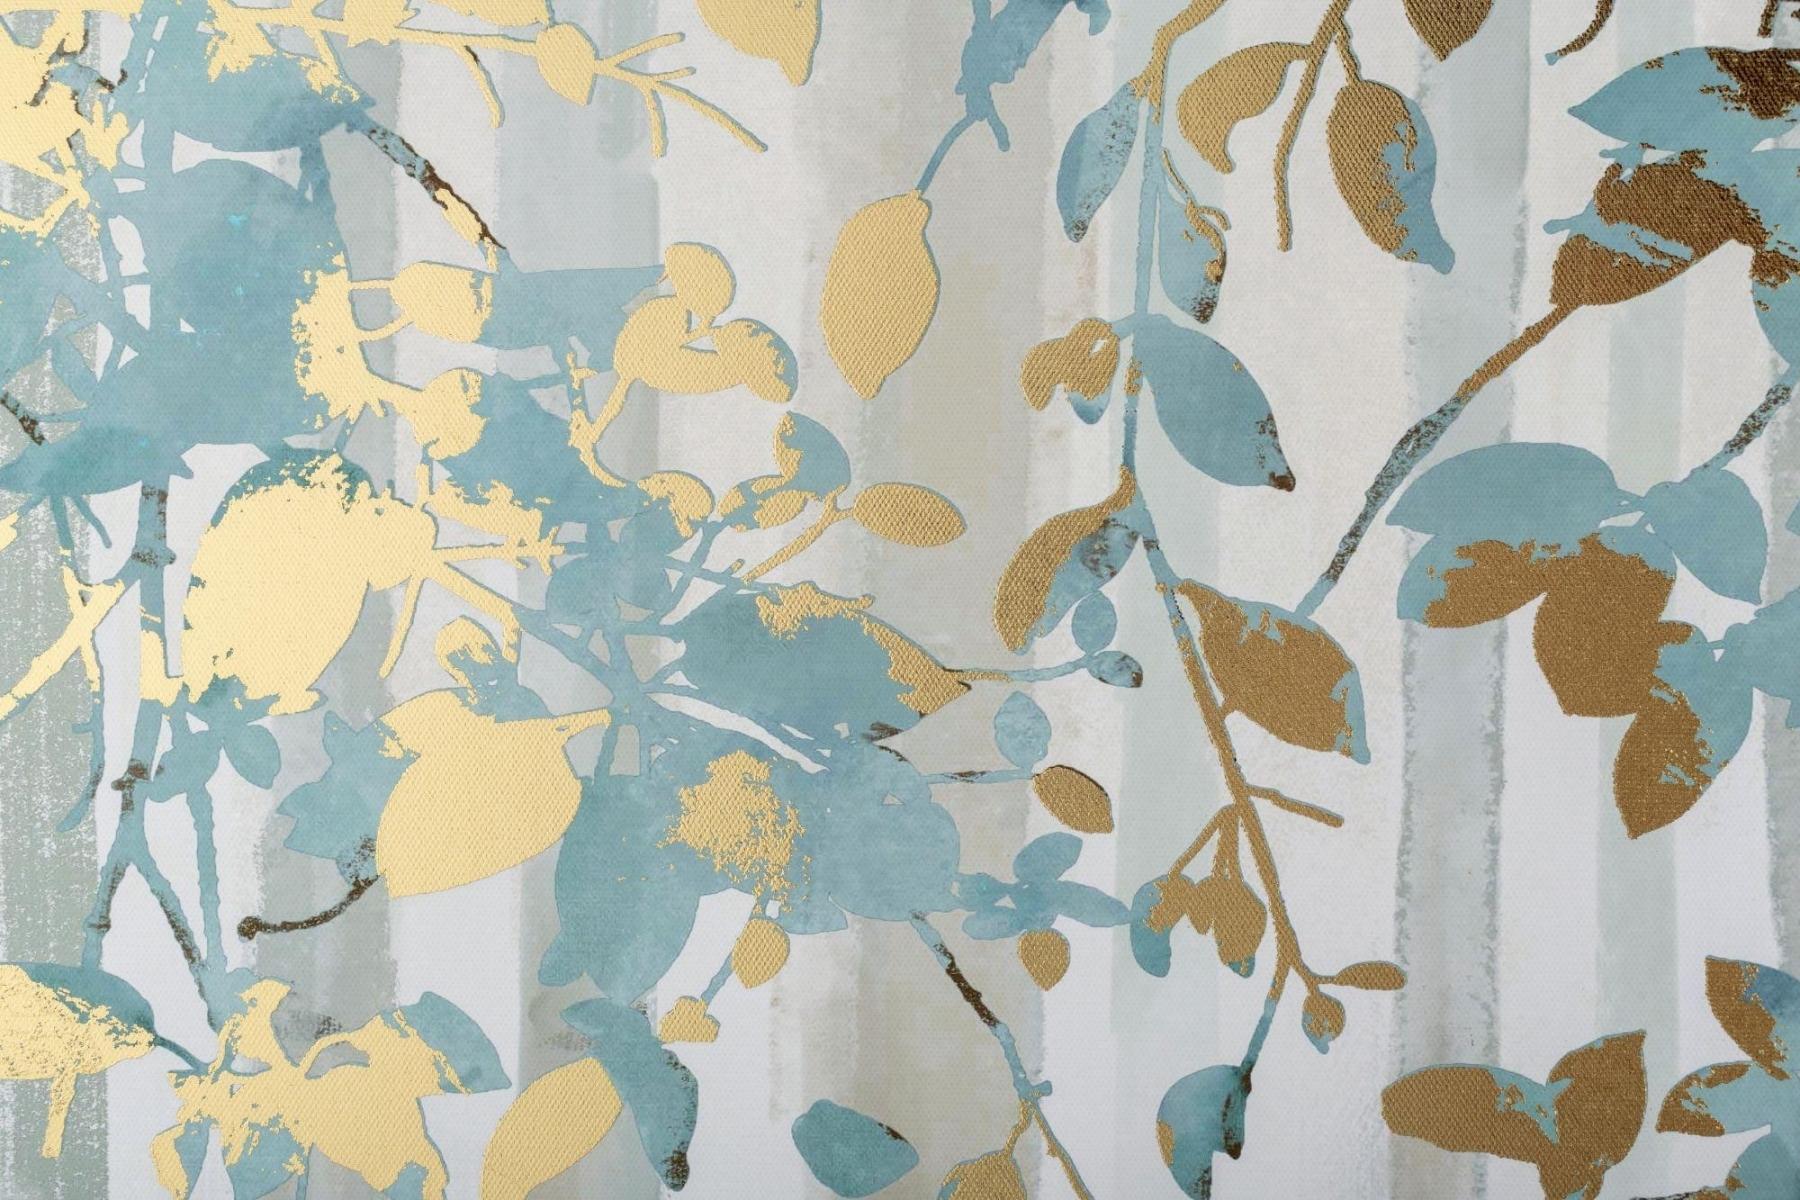 Декоративное интерьерное панно Tomas Stern 87039